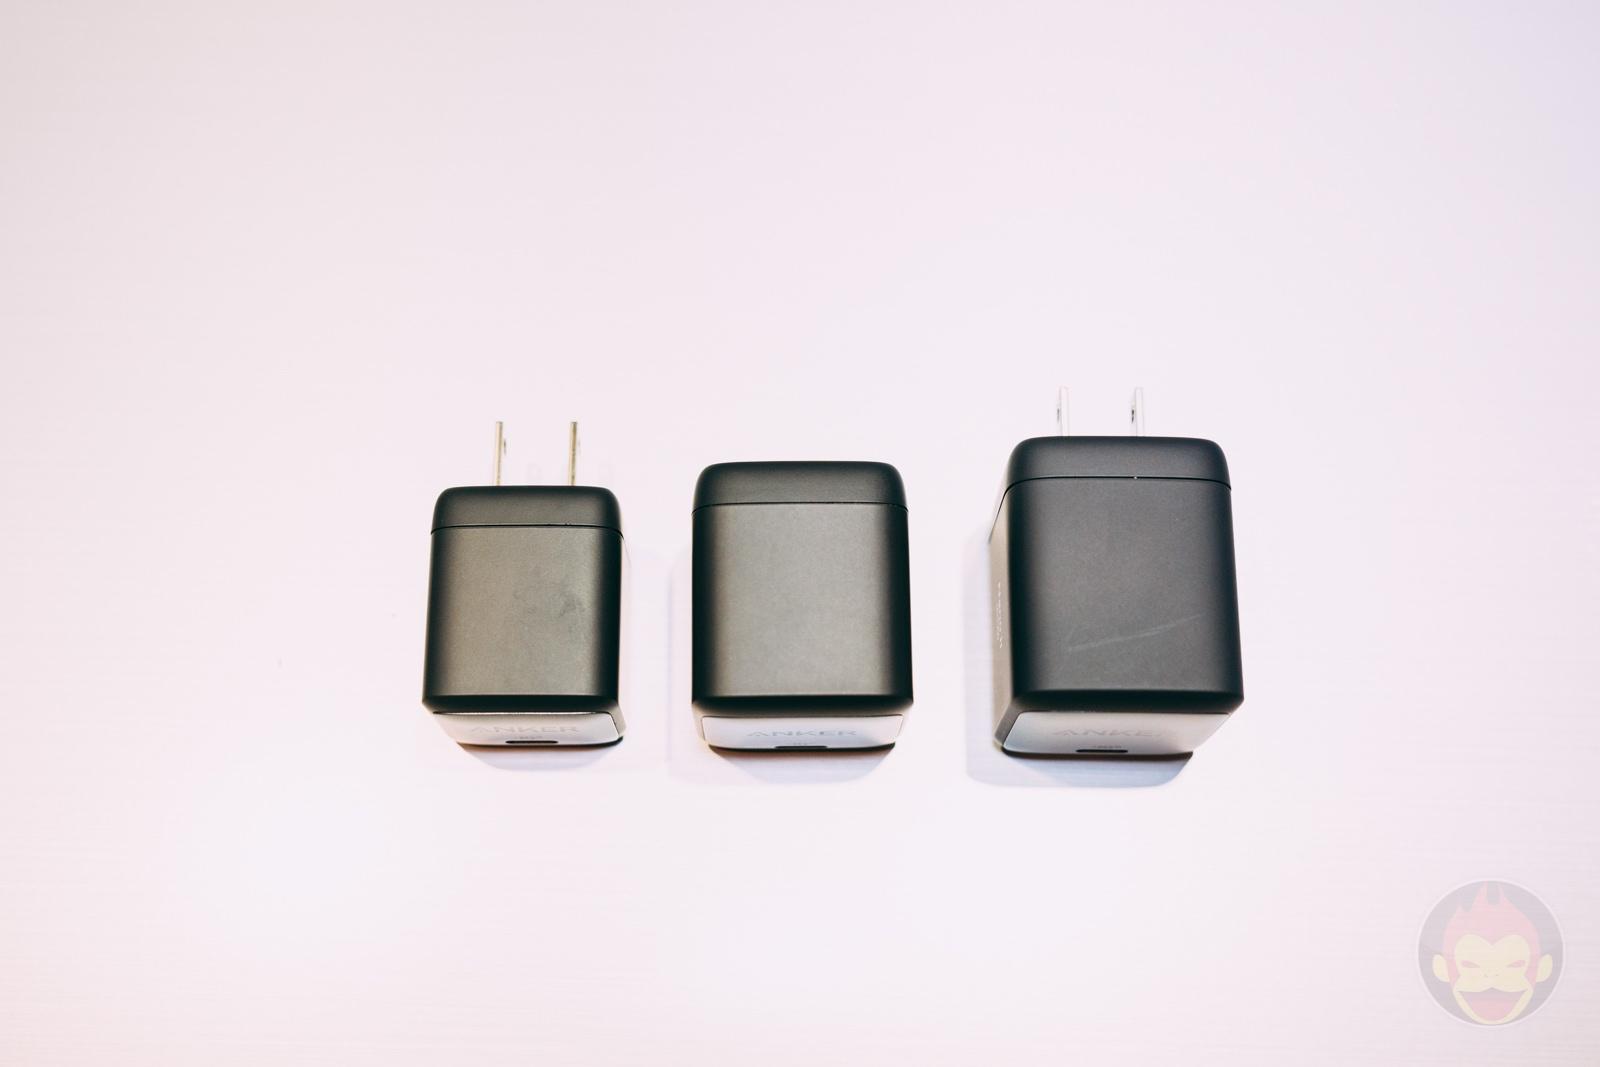 Anker GAN II Nano Series Hands On 04